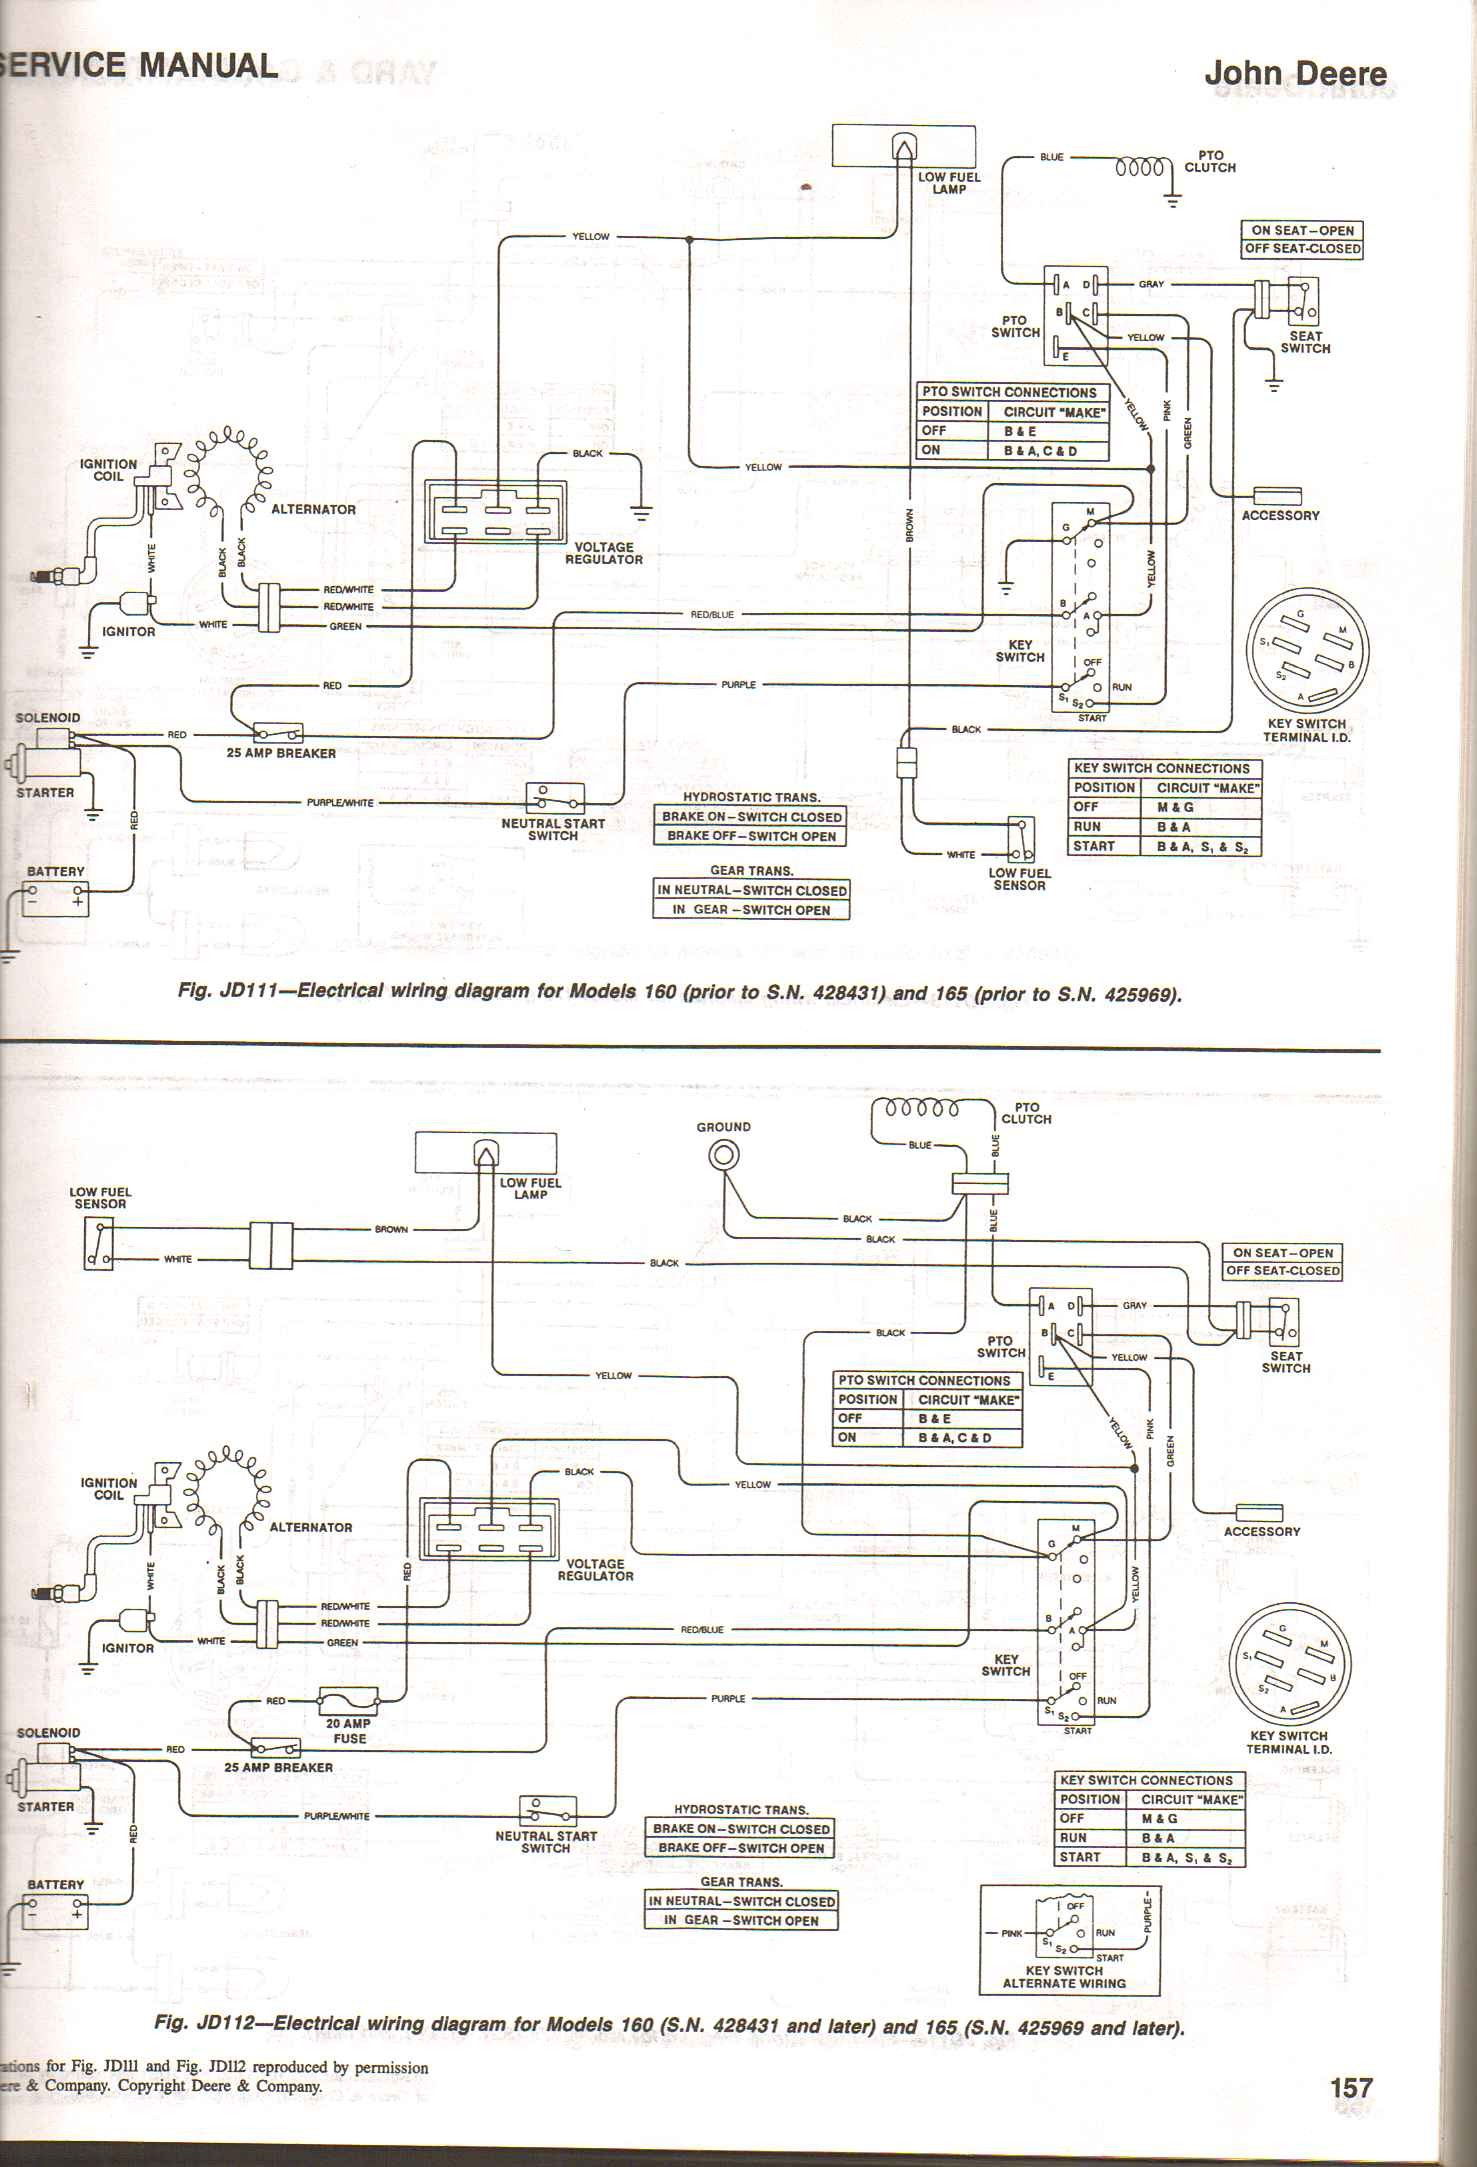 Wireing Diagram for John Deere 345 Rk 2830] John Deere Tractor Wiring Schematics Schematic Wiring Of Wireing Diagram for John Deere 345